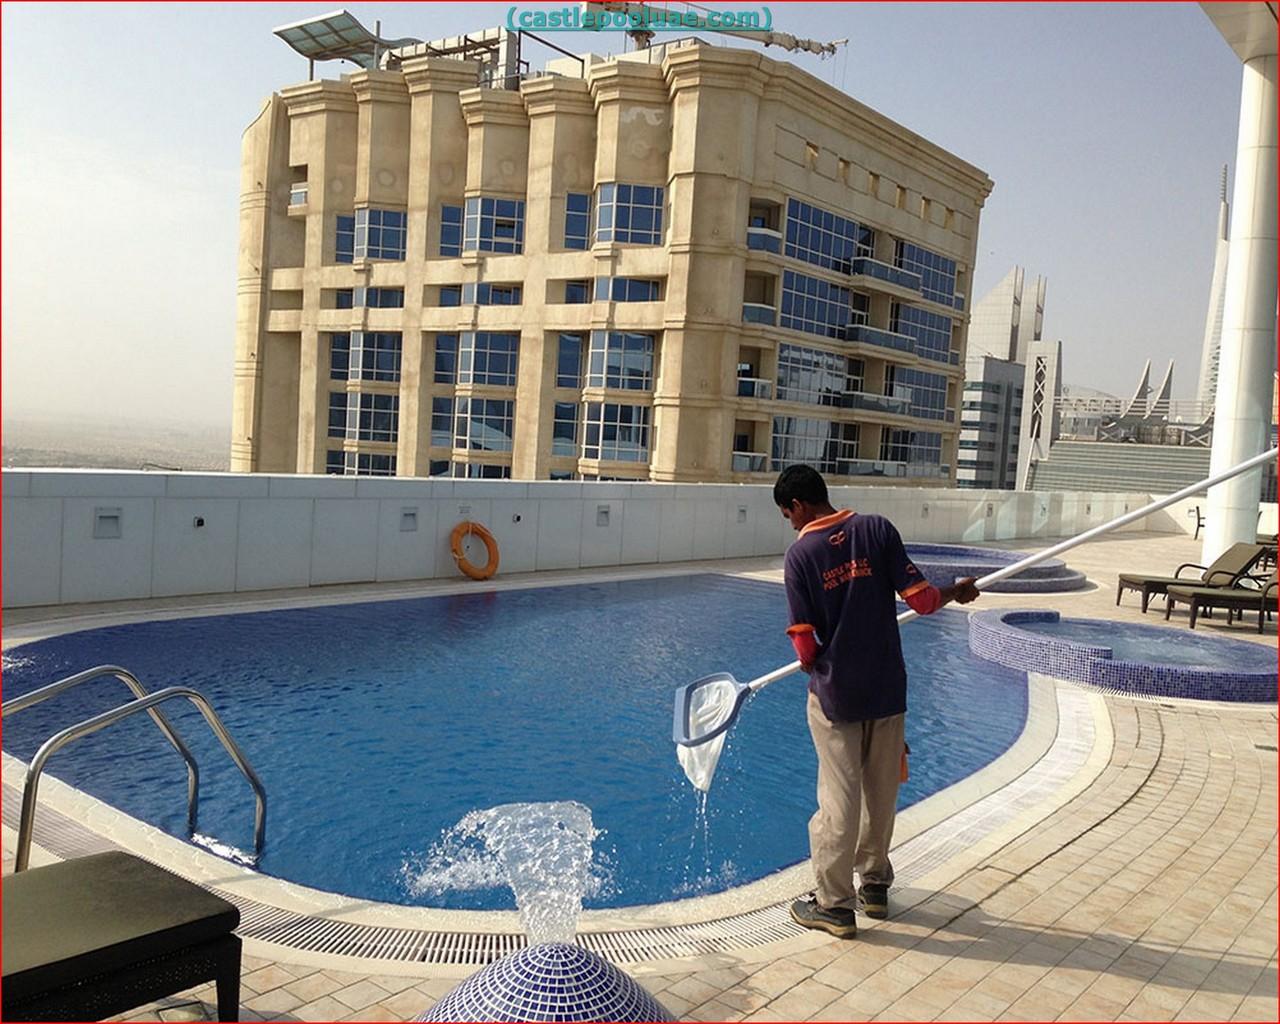 Swimming Pool Cleaning Companies : Swimming pool service companies in dubai uae